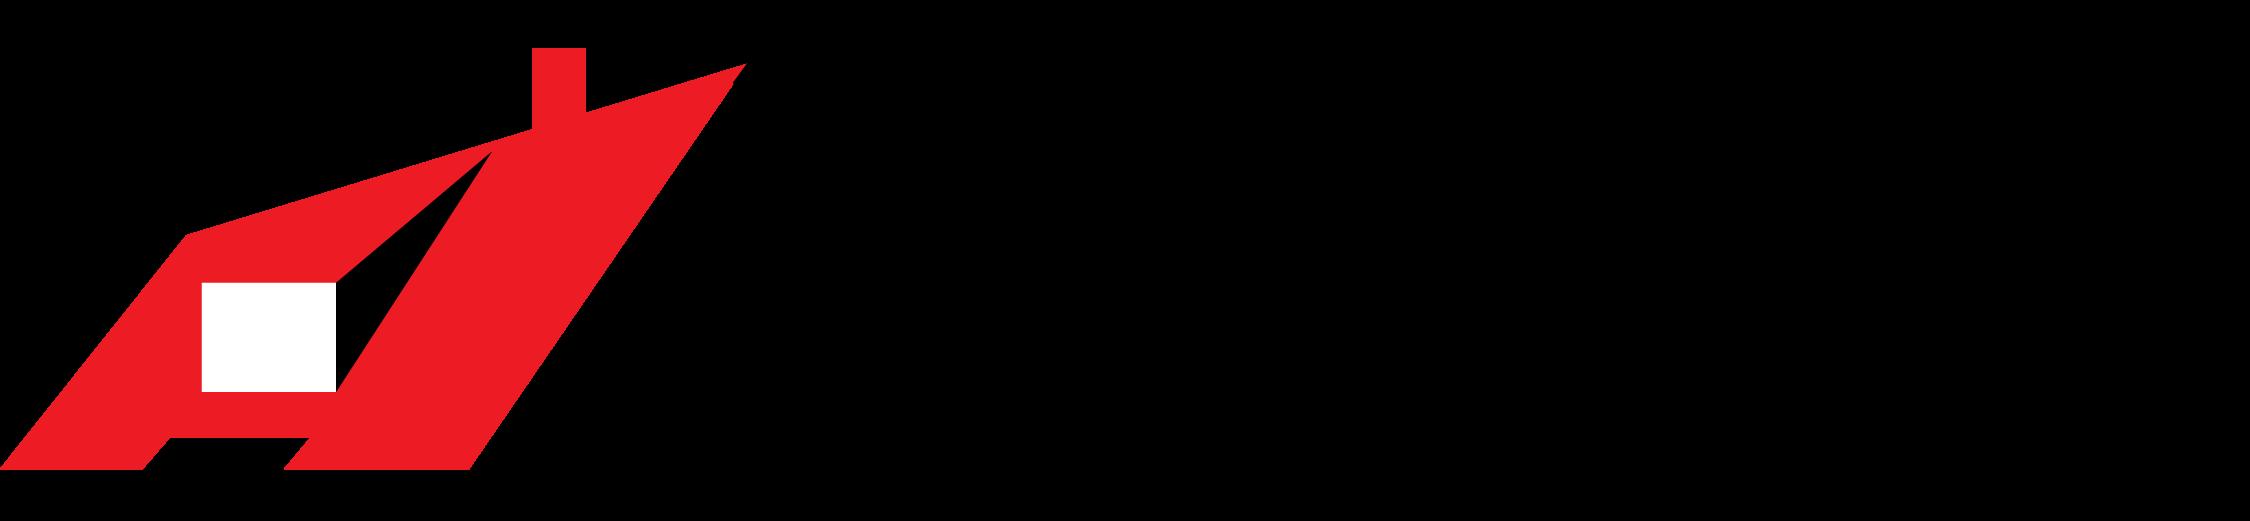 Yuvam Prefabrik Ltd. Şti.